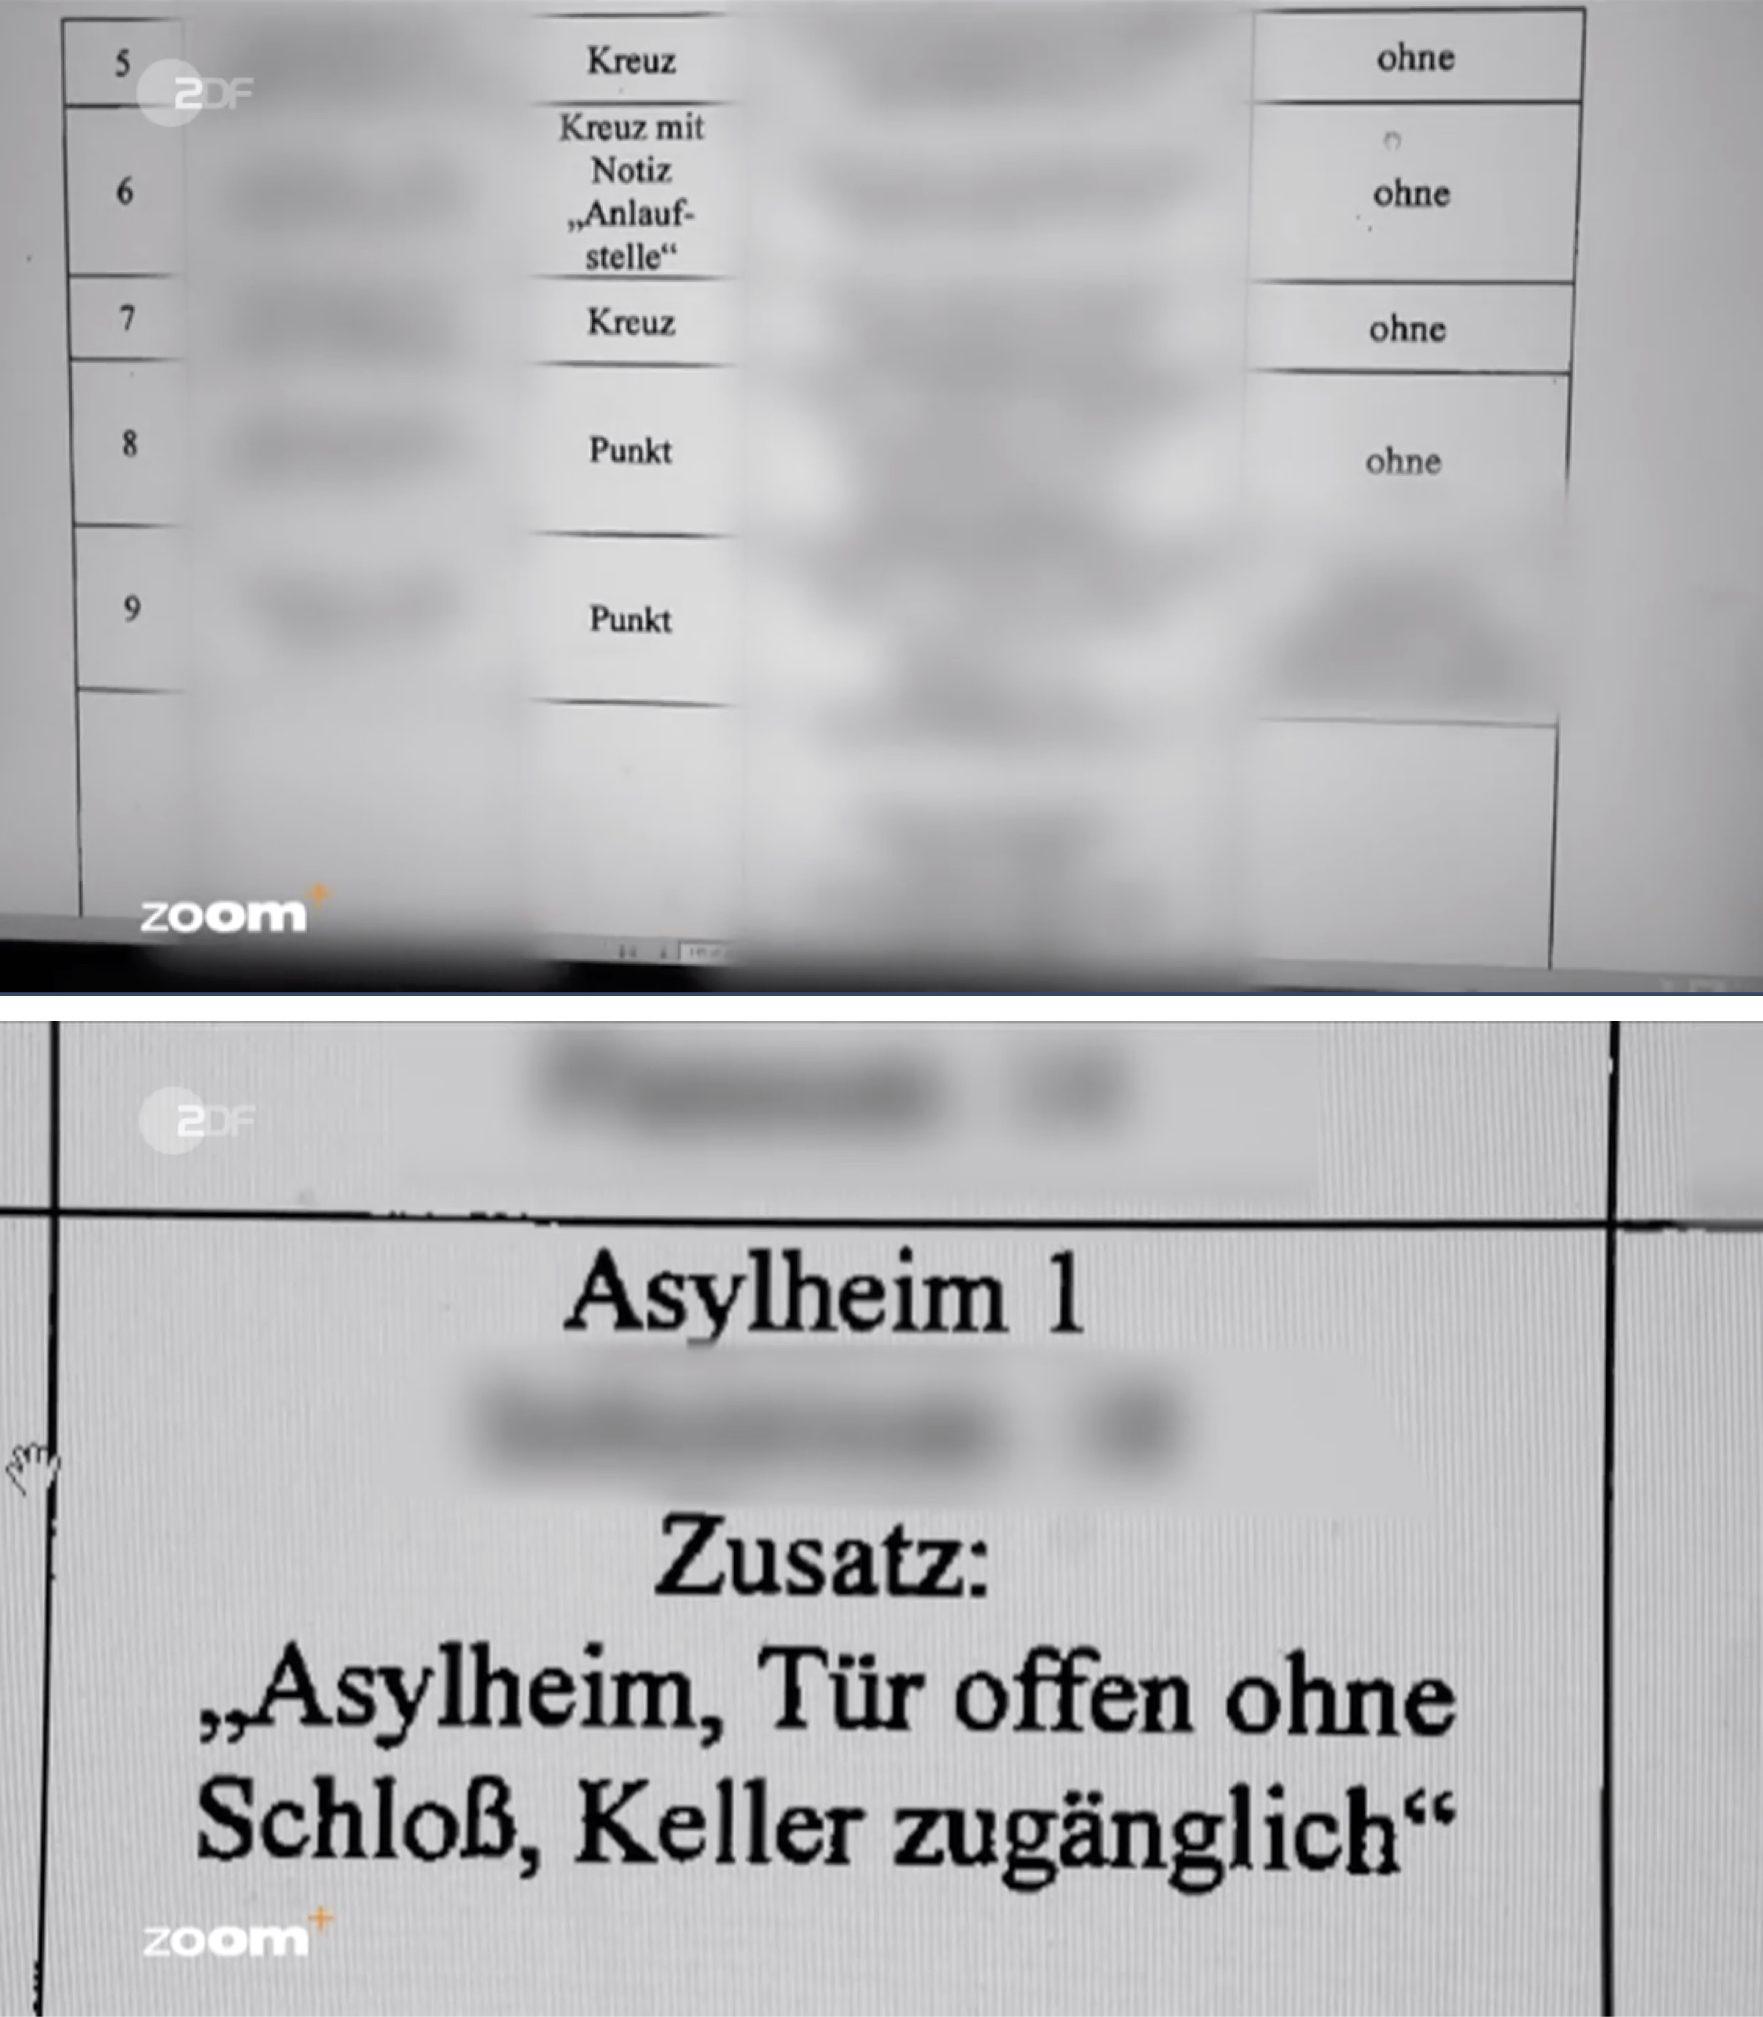 Todesliste NSU (ZDF) https://www.zdf.de/nachrichten/heute/zdf-zoom-doku-zu-nsu-100.html